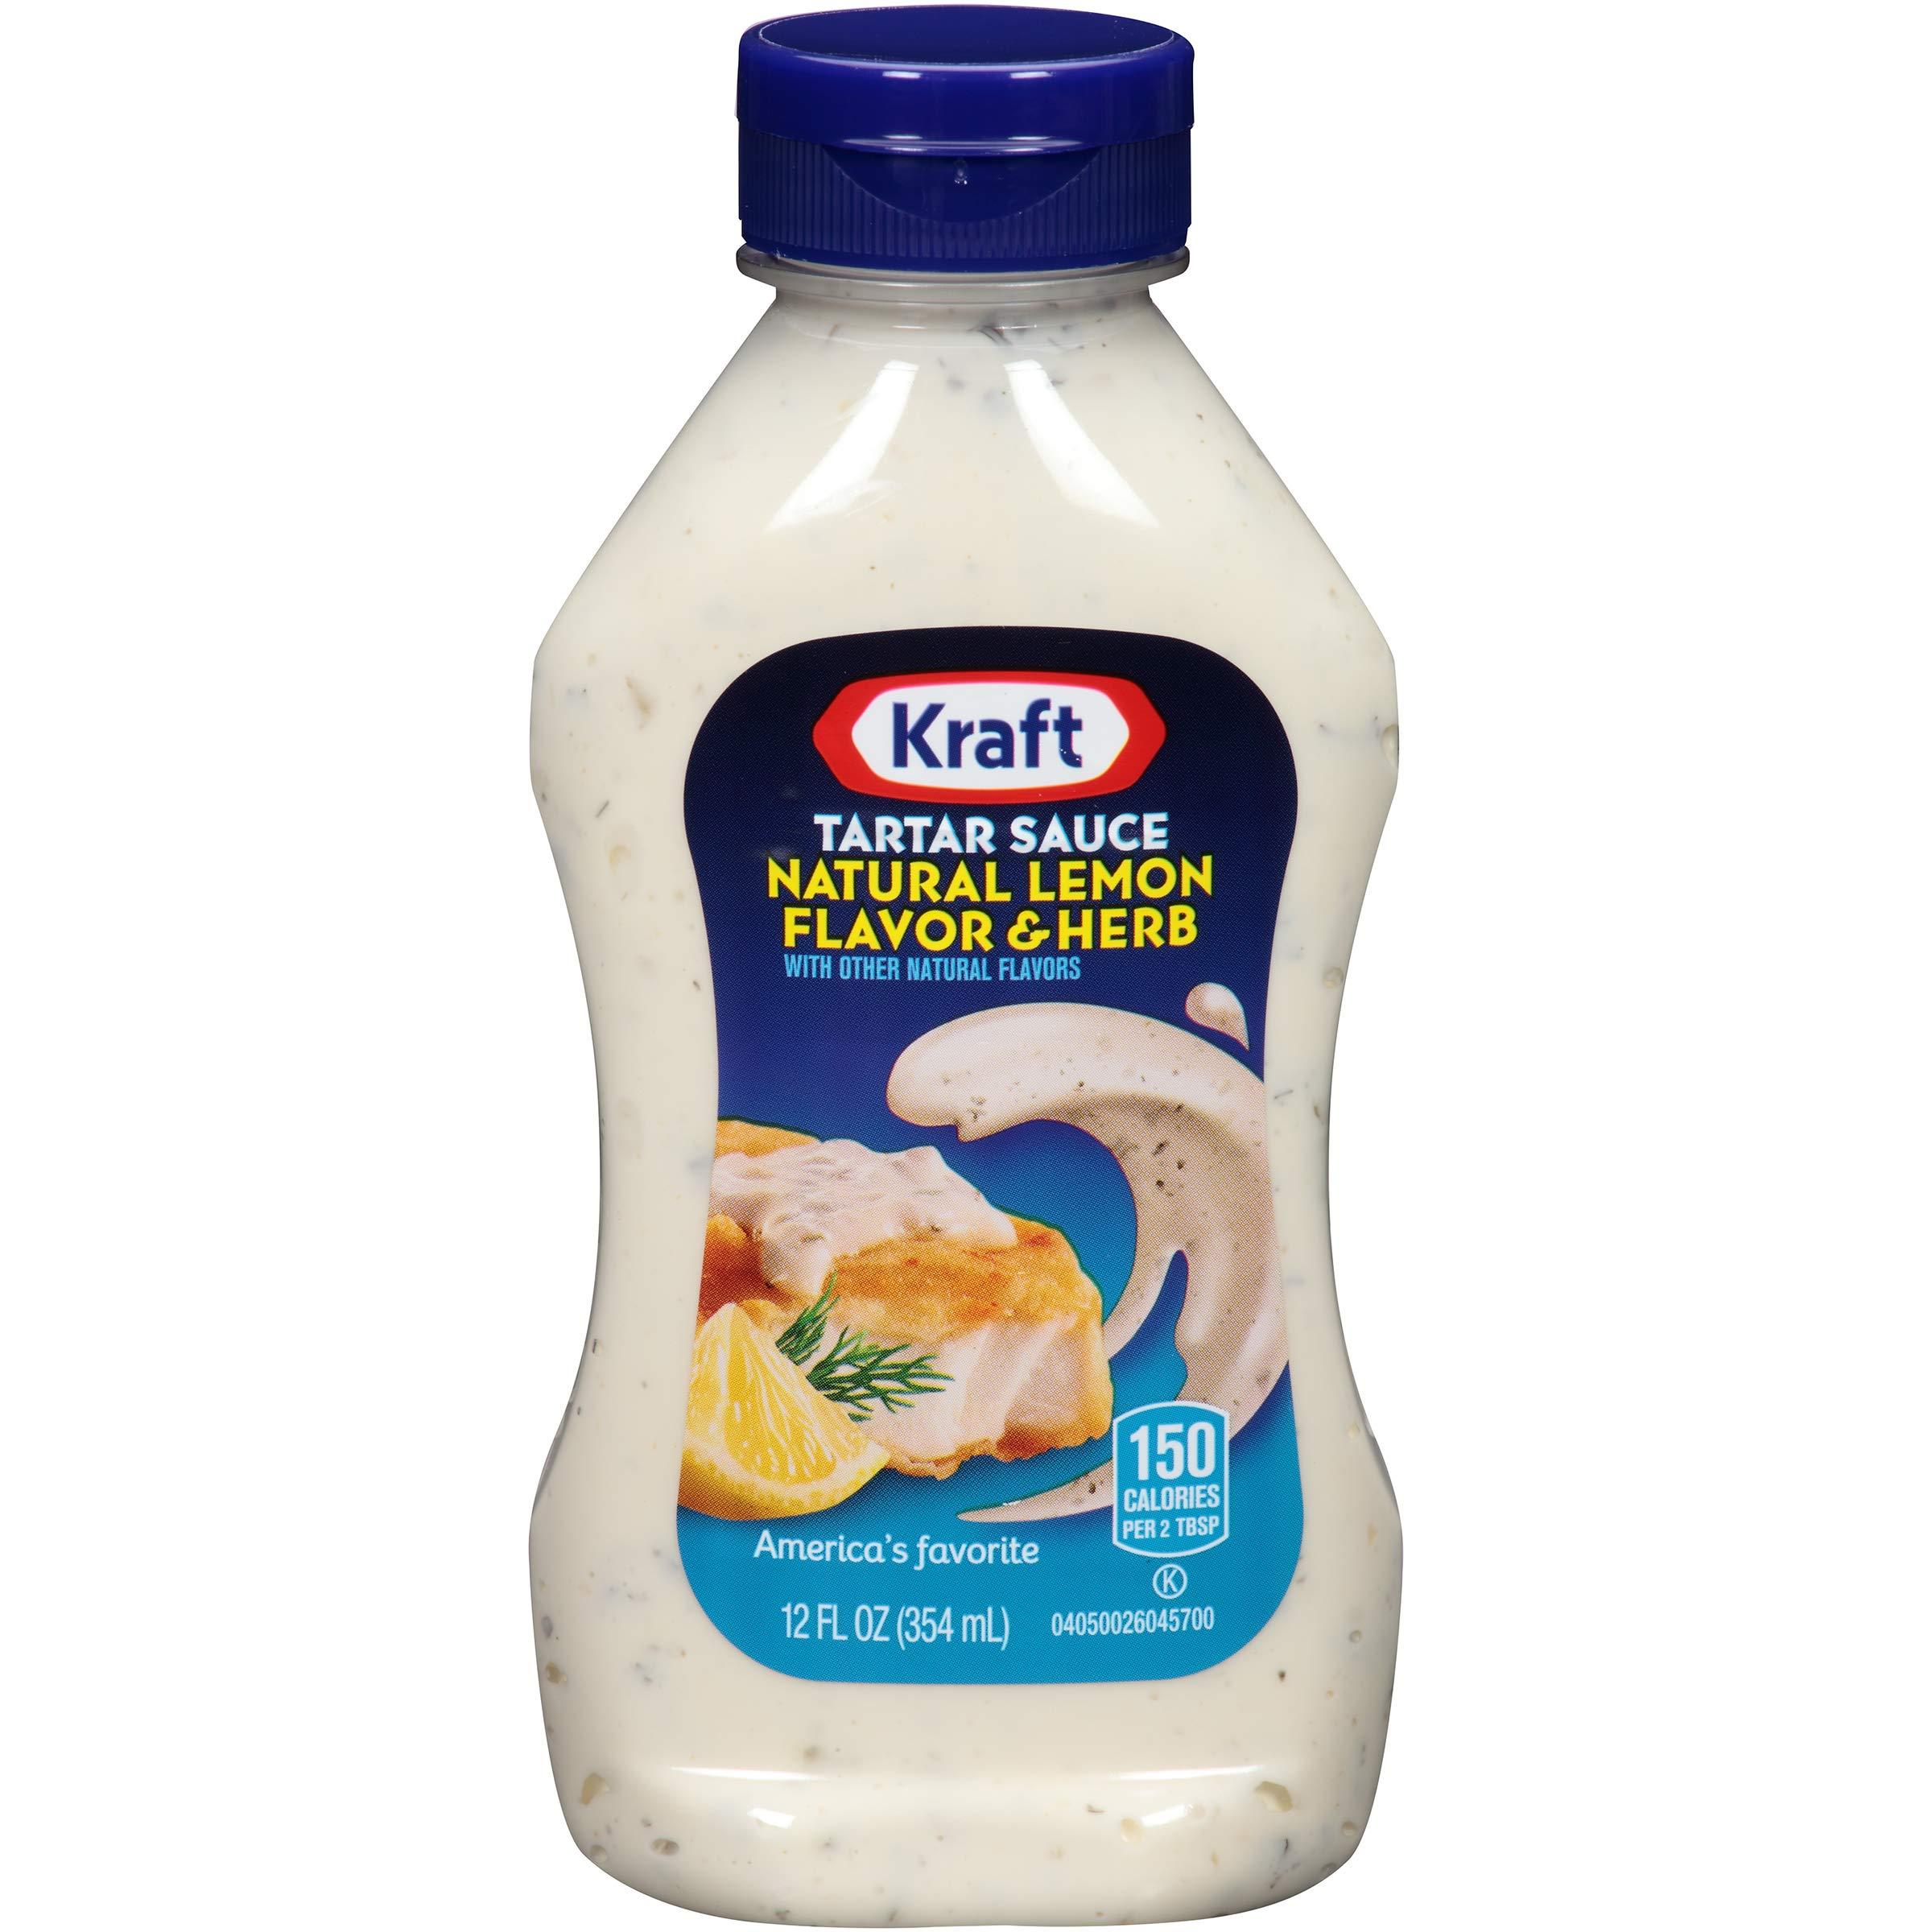 Kraft Natural Lemon & Herb Tartar Sauce (12 oz, Pack of 12) by Kraft Brand Sauce